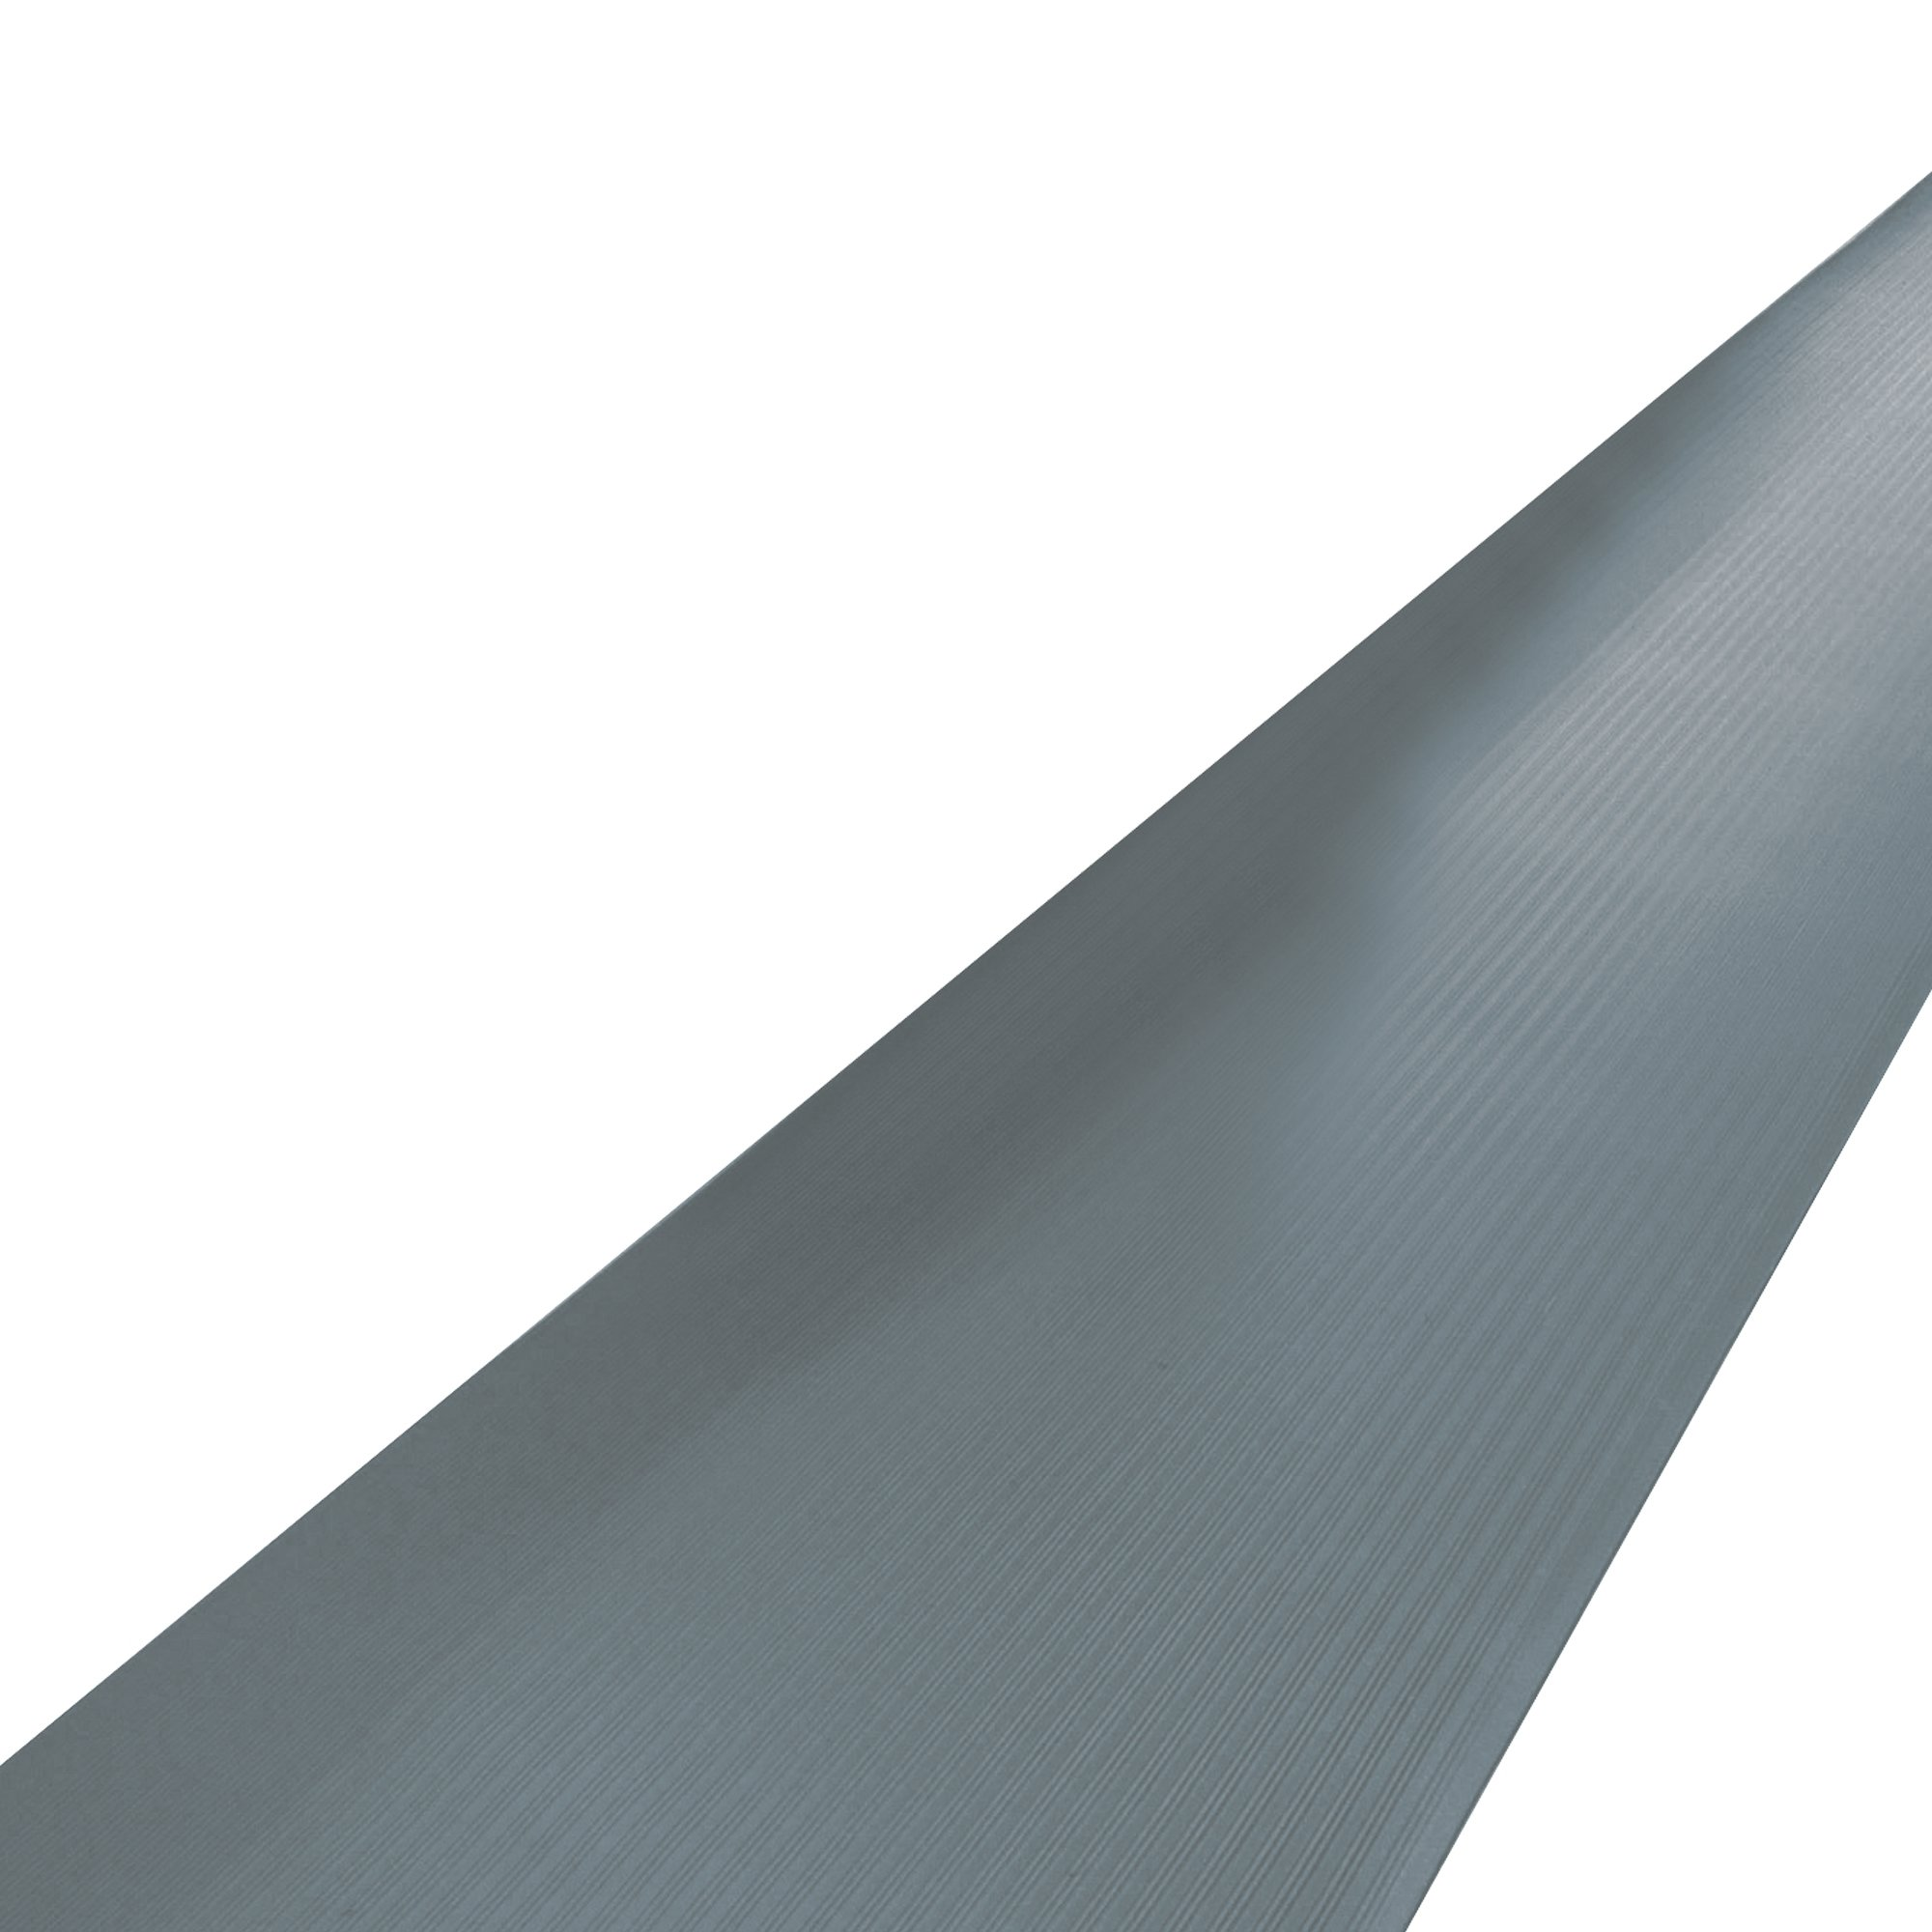 4 x 4' Gray Economy Anti-Fatigue Mat